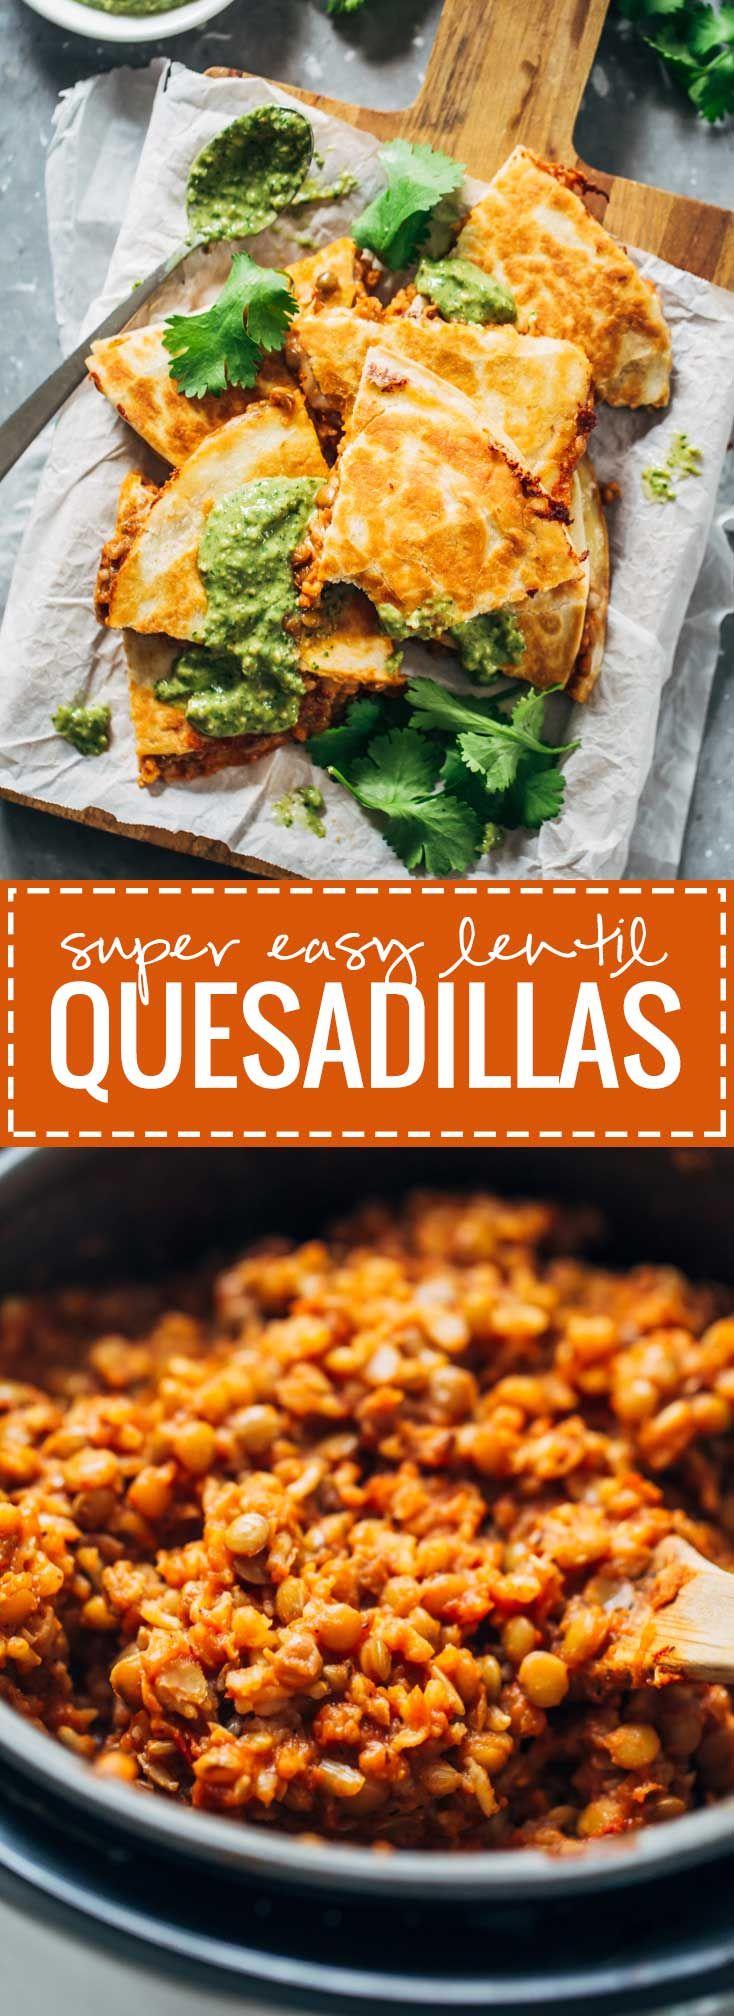 Quick and Easy Lentil Quesadillas - vegetarian comfort food!   pinchofyum.com